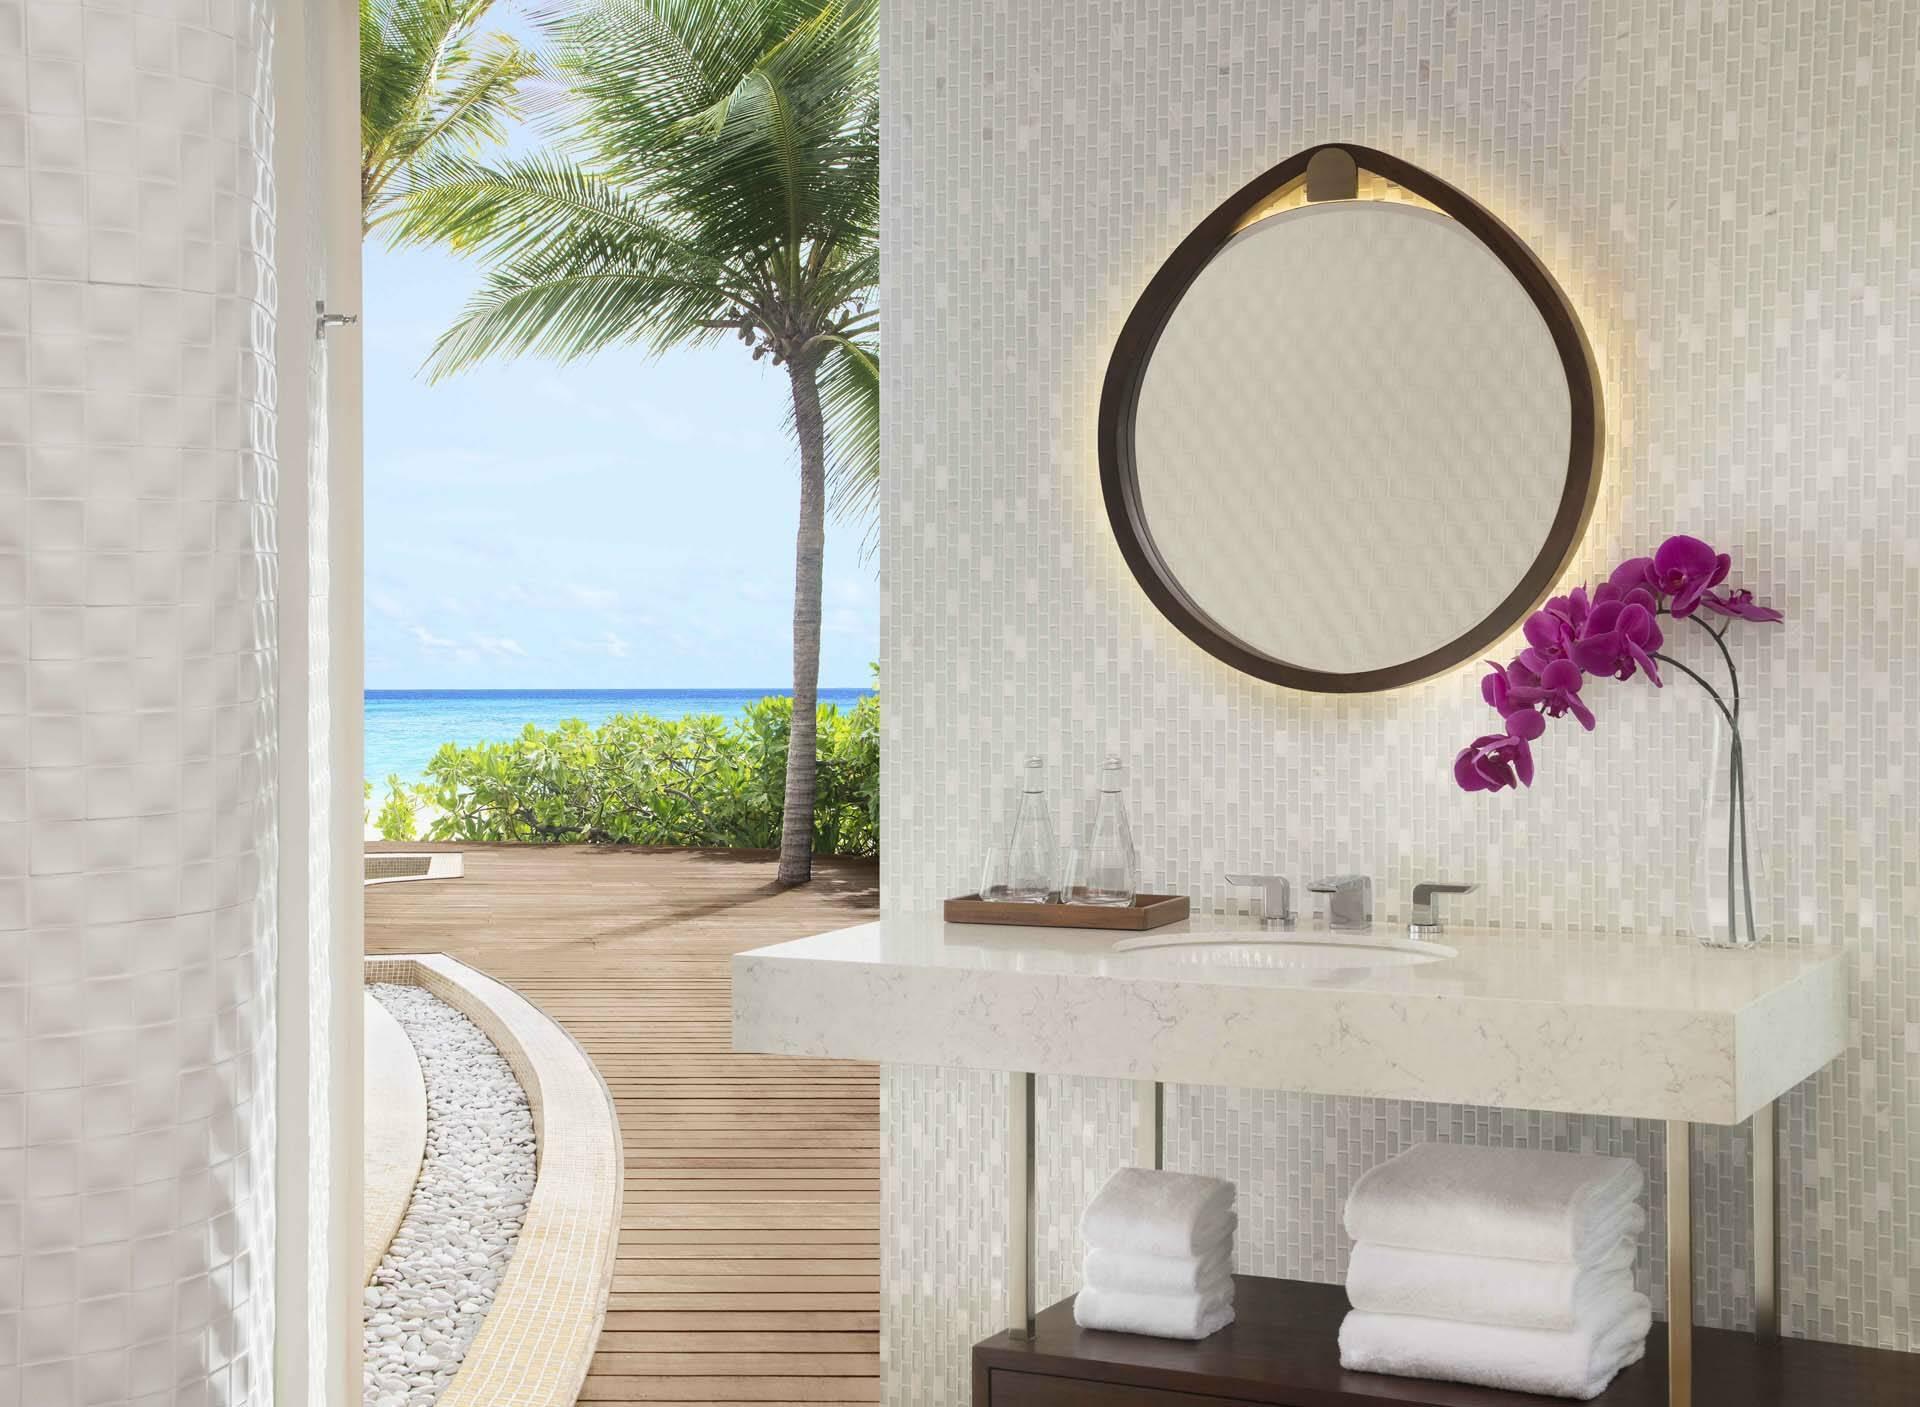 JW Marriott Maldives bathroom